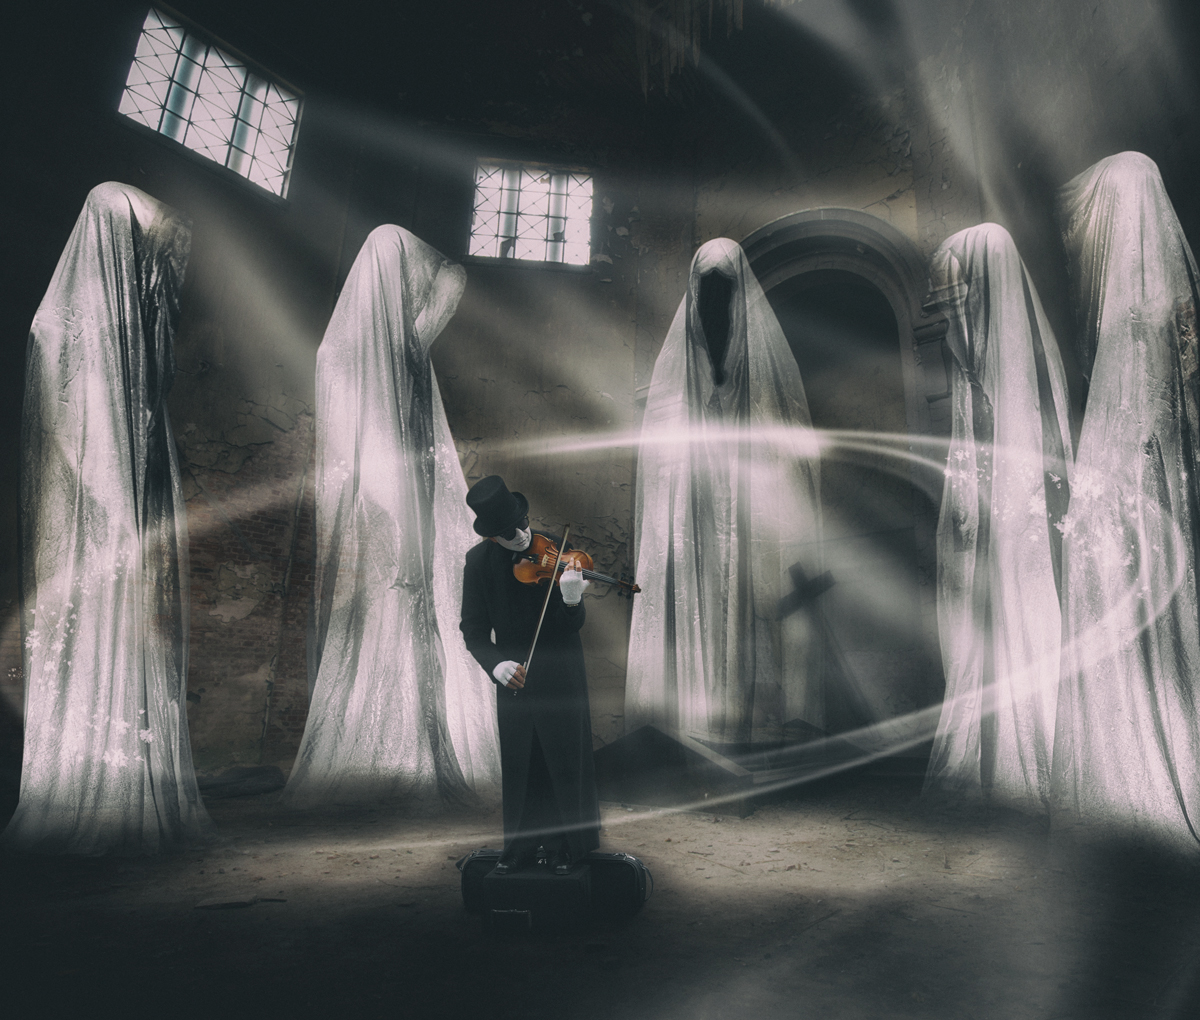 die Geister die ich rief II